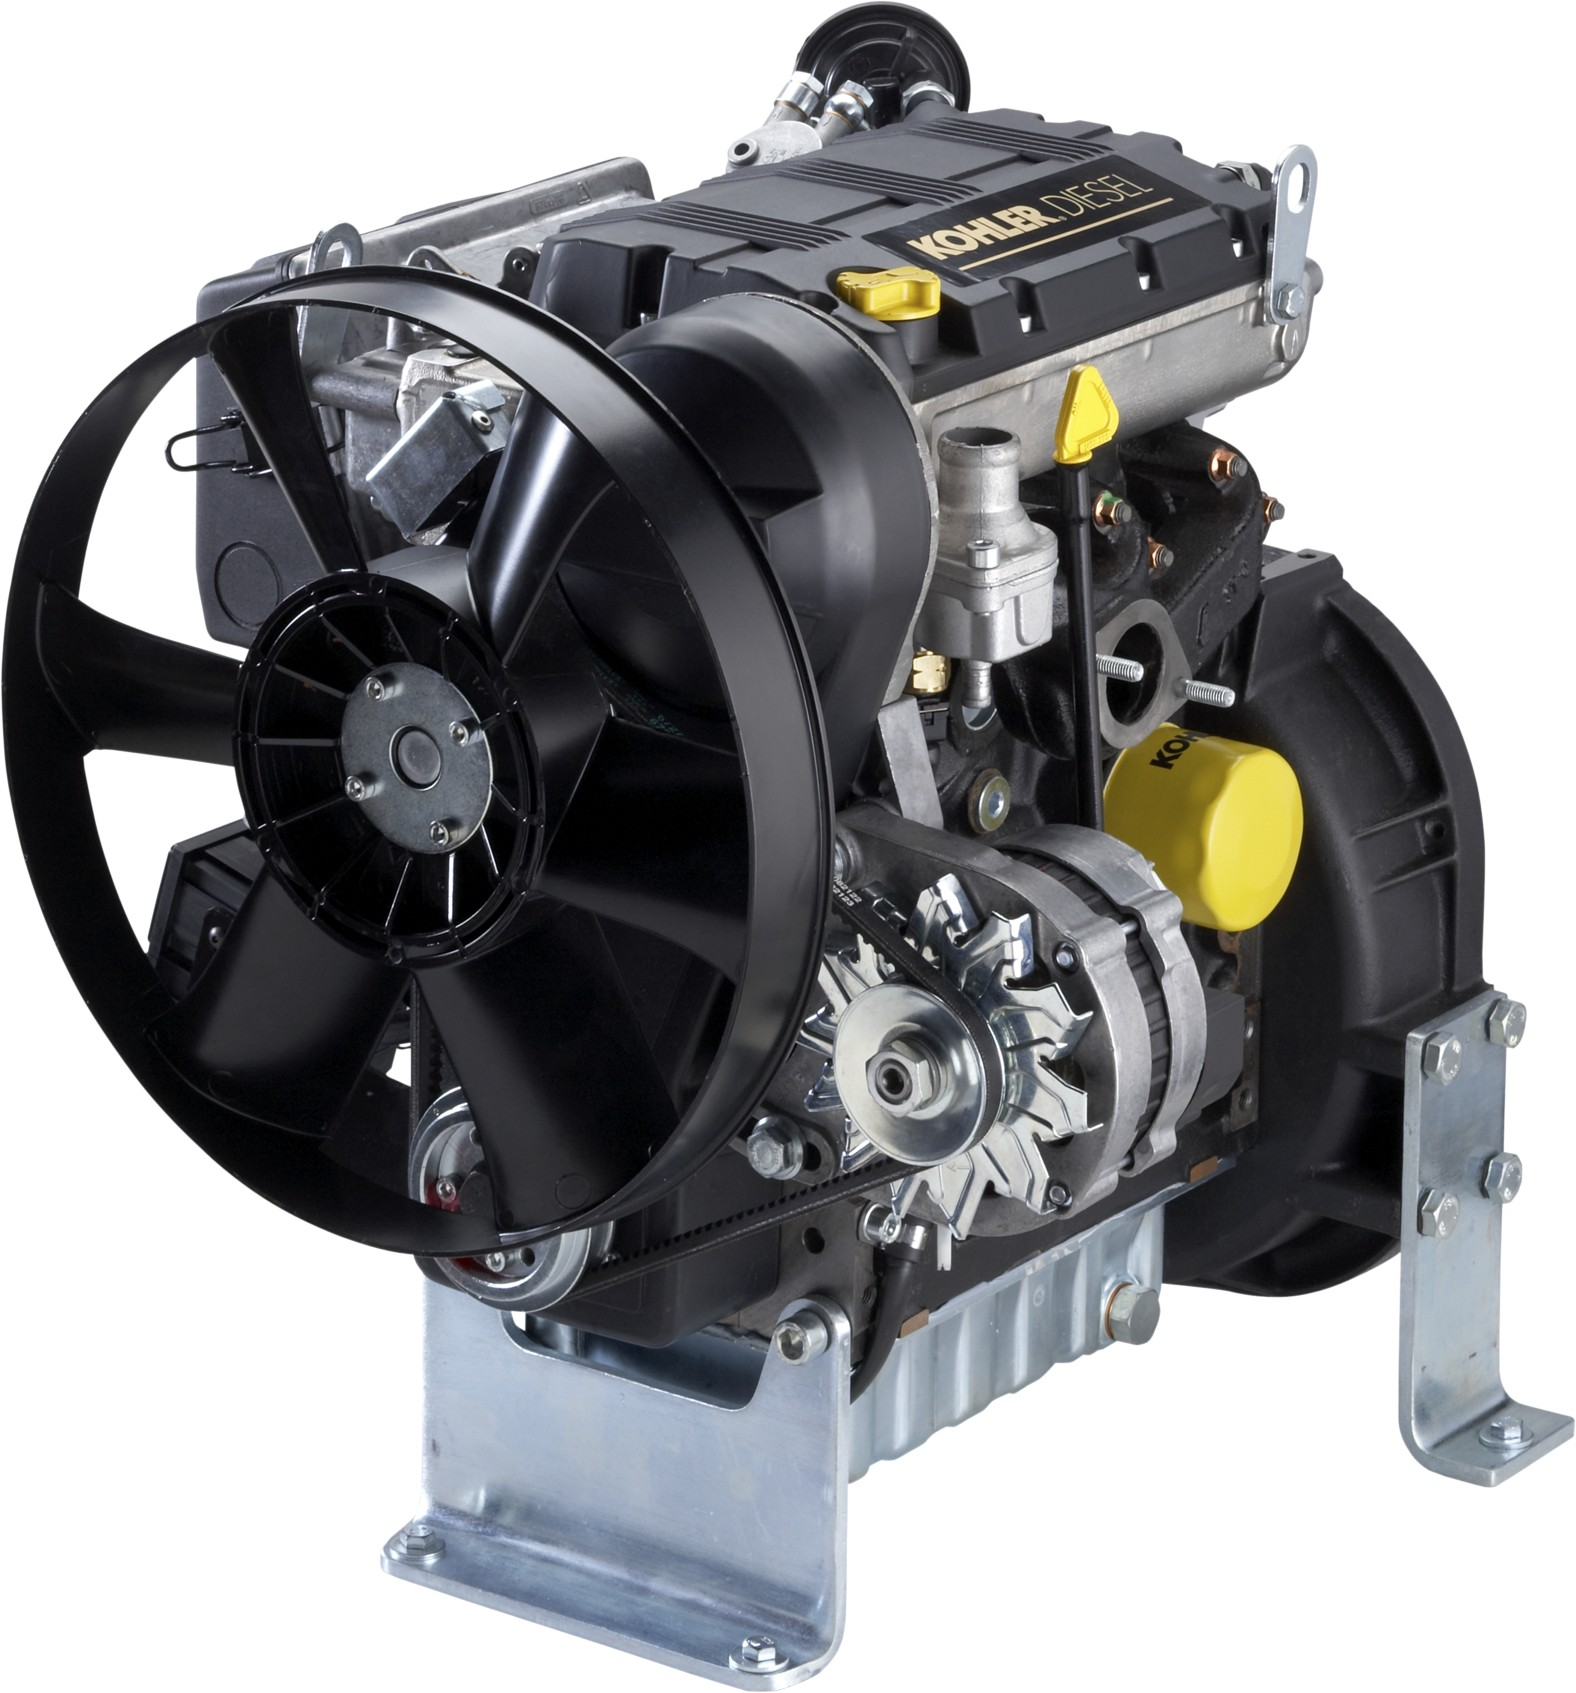 kohler engines kdw1003 kohler diesel liquid cooled product detail rh kohlerengines com kohler 20kw diesel generator specs kohler 8kw diesel generator manual